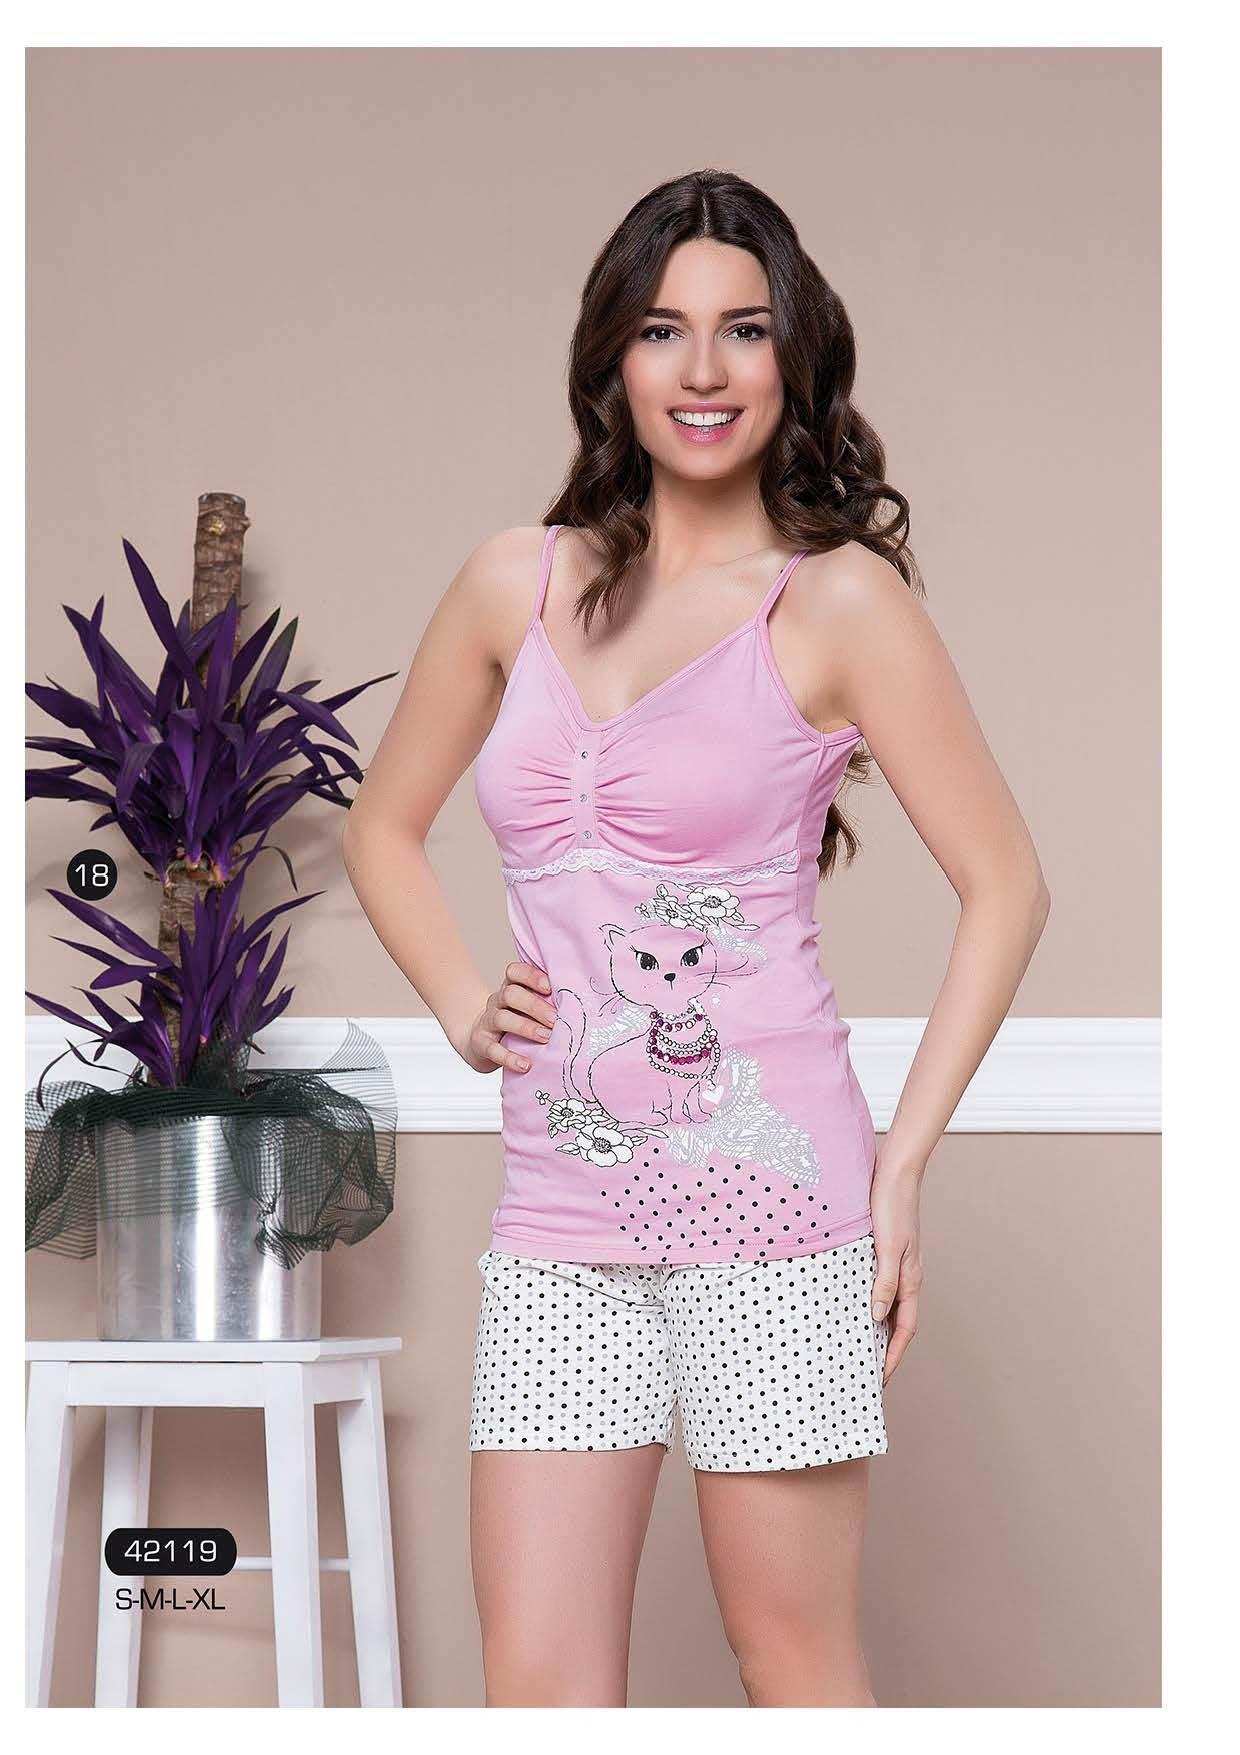 Пижамы Moyra Caprice Пижама Pisces  (S) пижама жен mia cara майка шорты botanical aw15 ubl lst 264 р 42 44 1119503